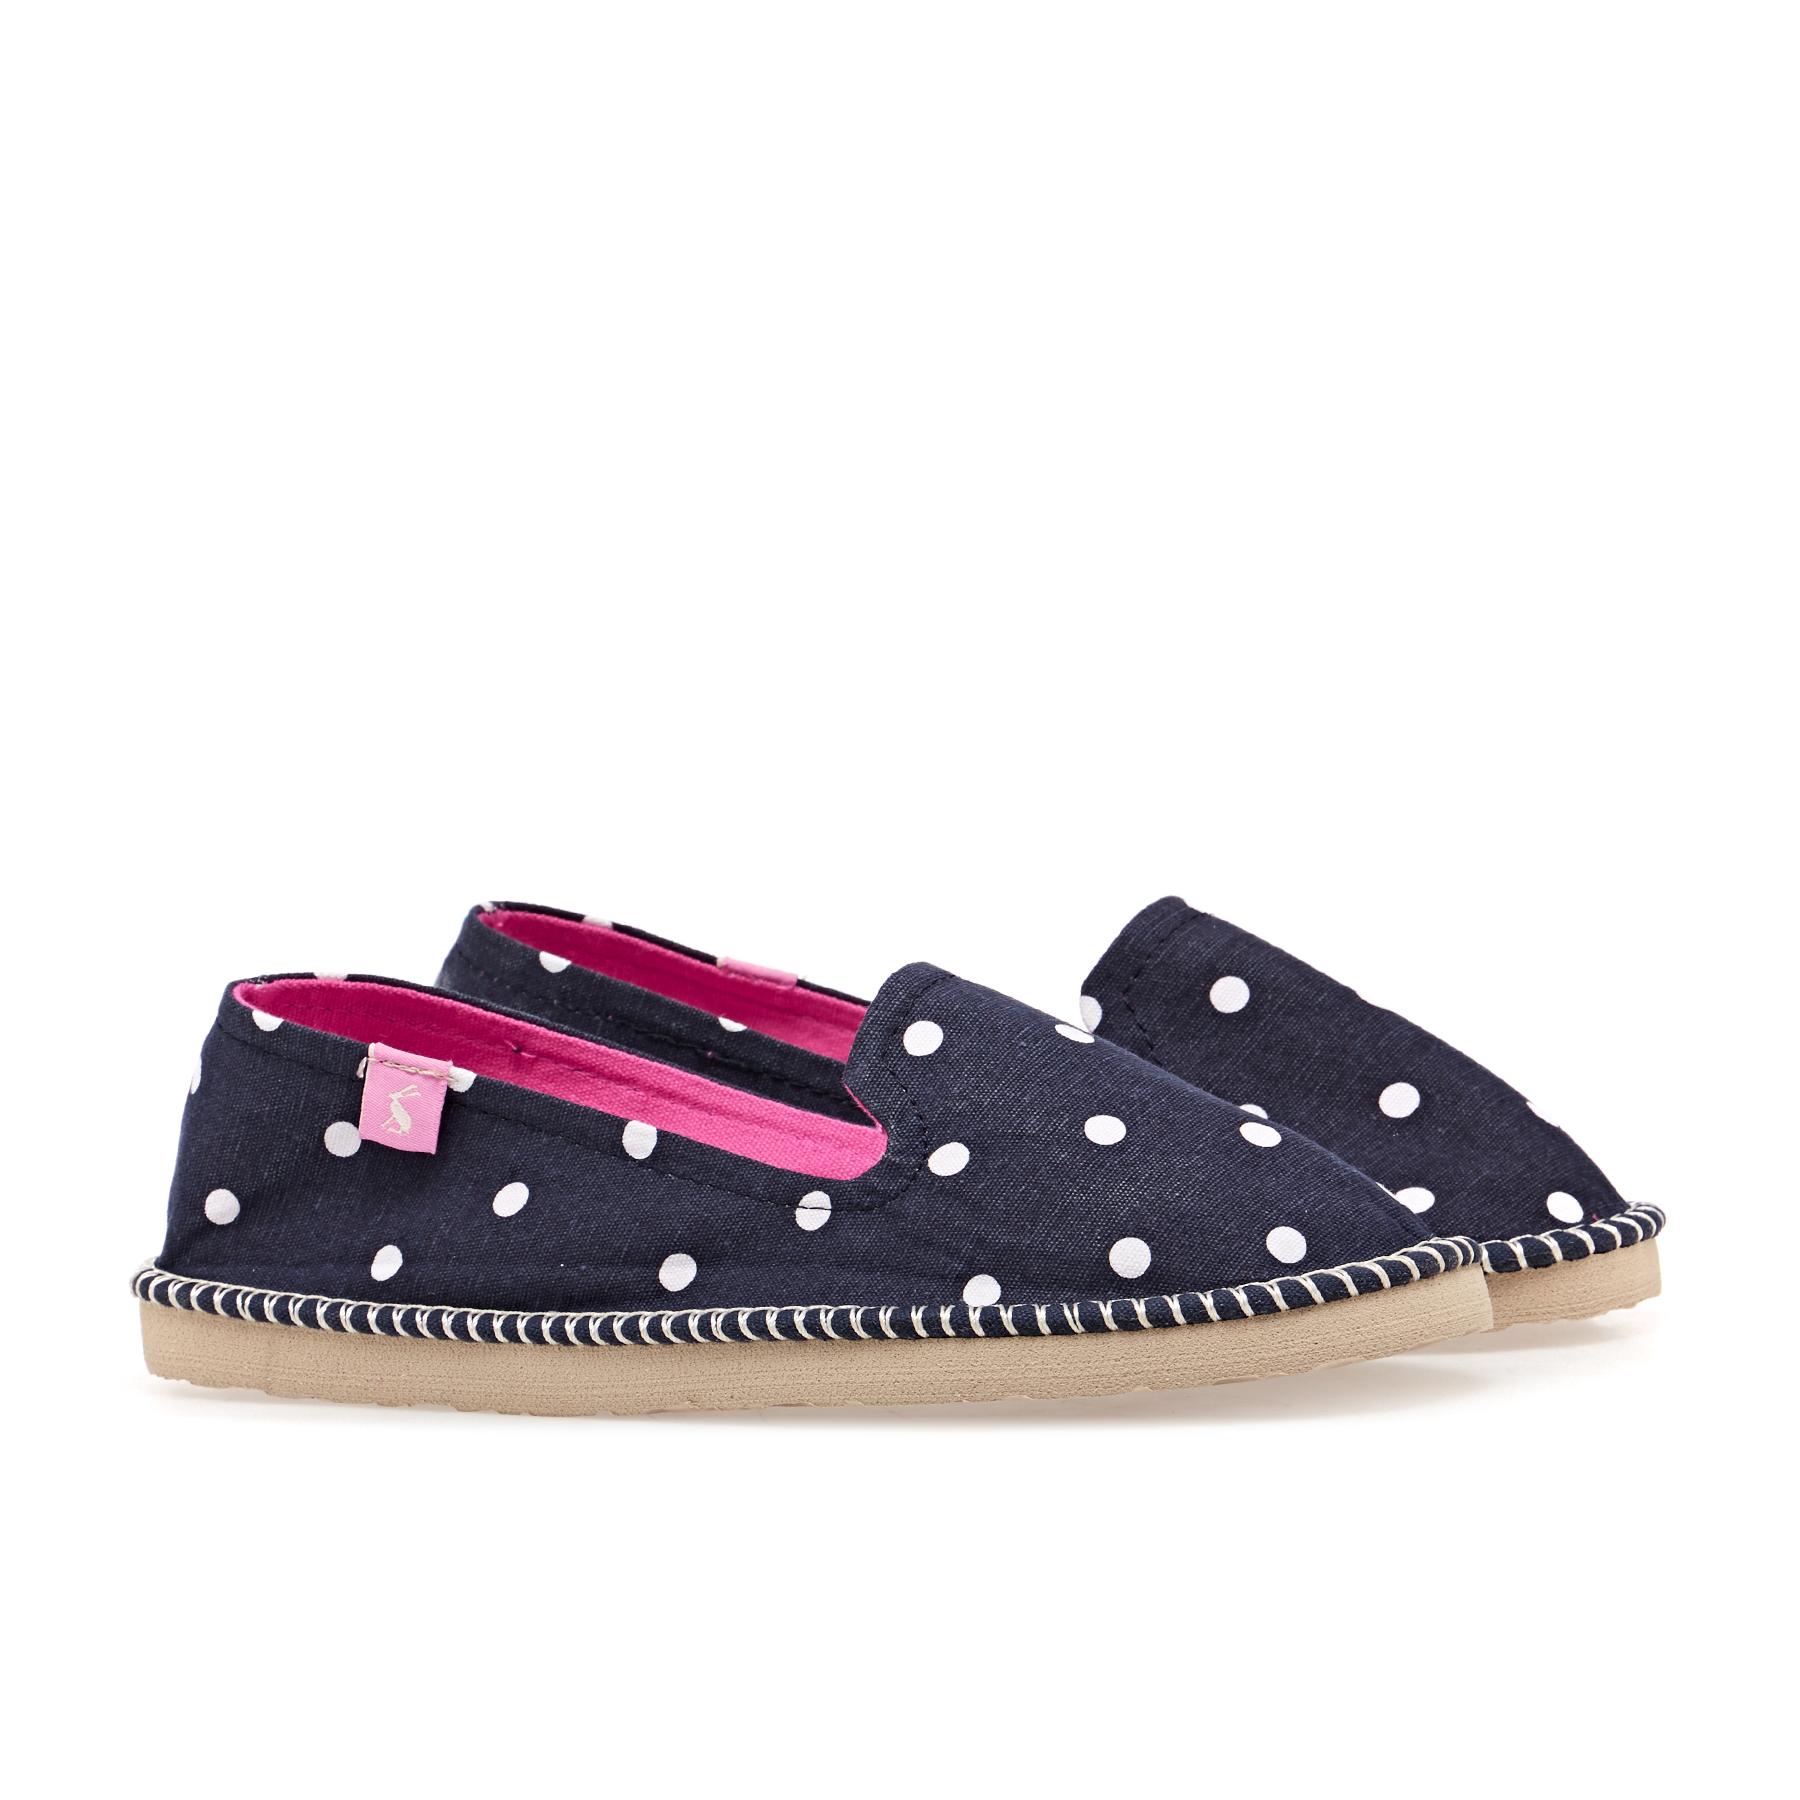 Joules FLIPADRILLE Ladies Womens Canvas Espadrille Low Top Flat Shoes Navy Spot